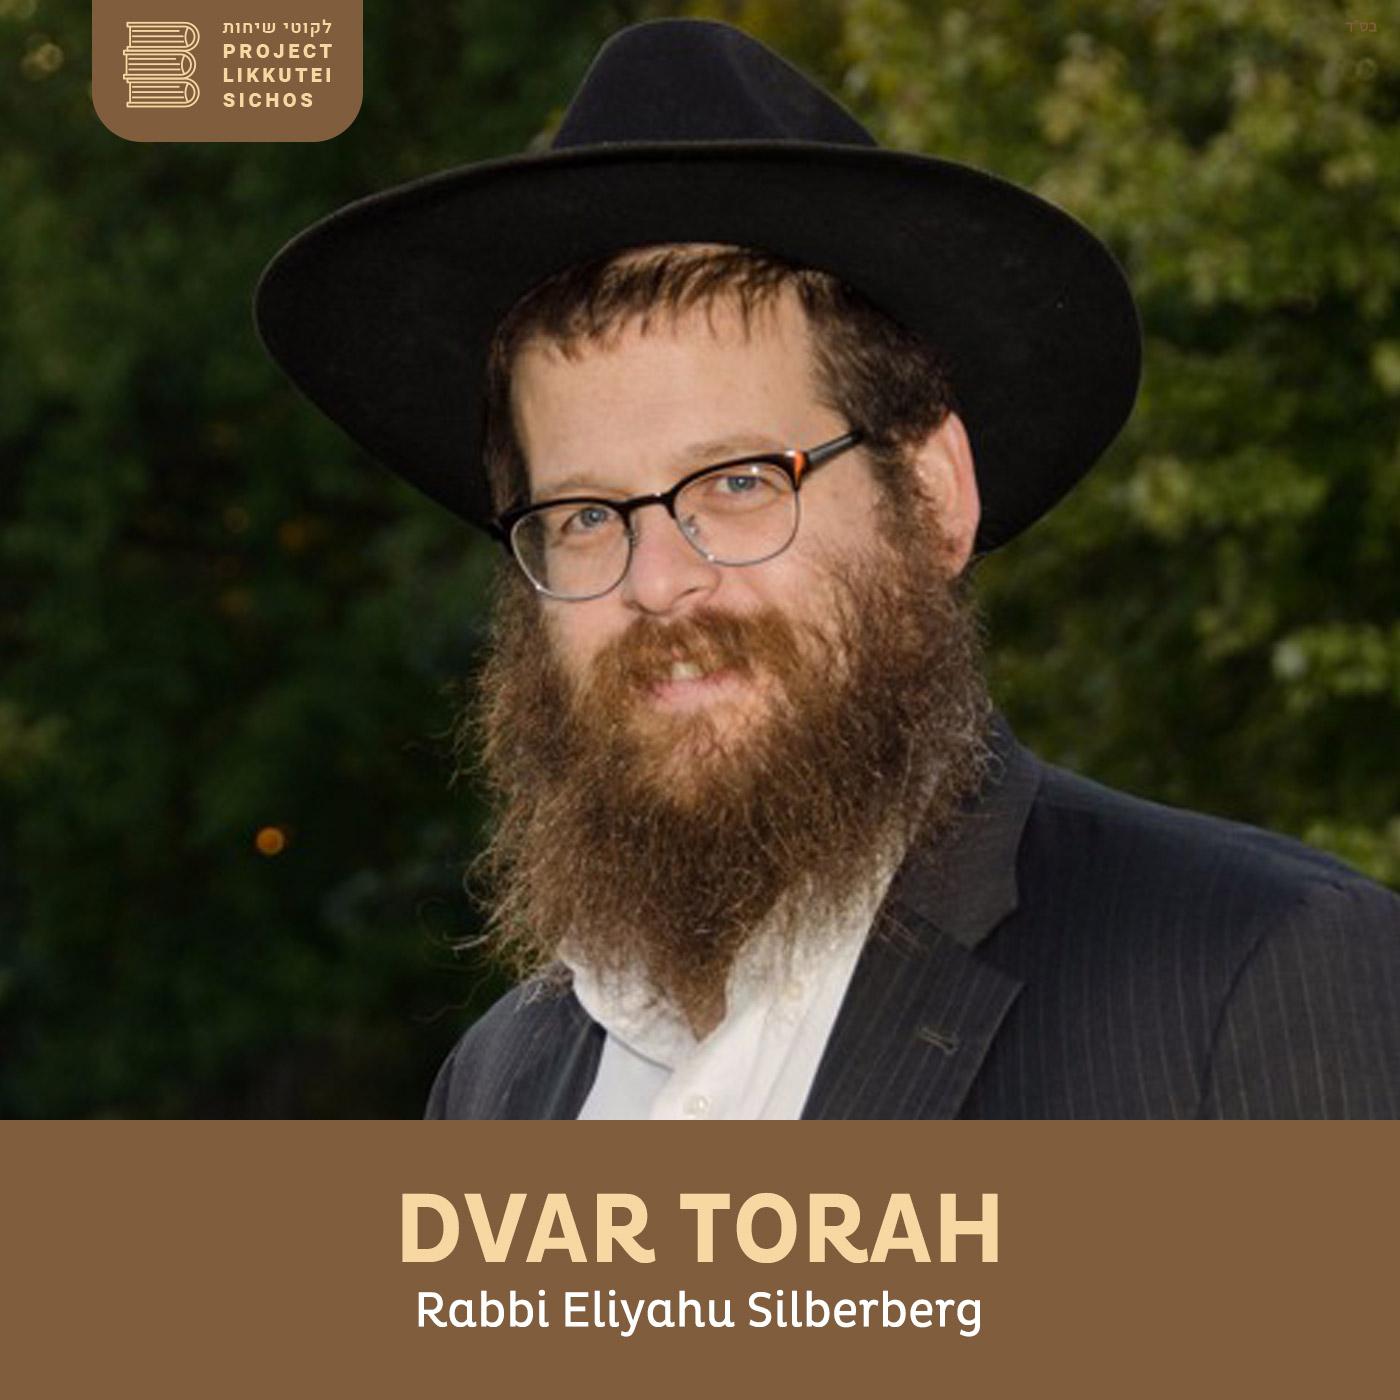 Artwork for podcast Dvar Torah, Rabbi Elyahu Silberberg